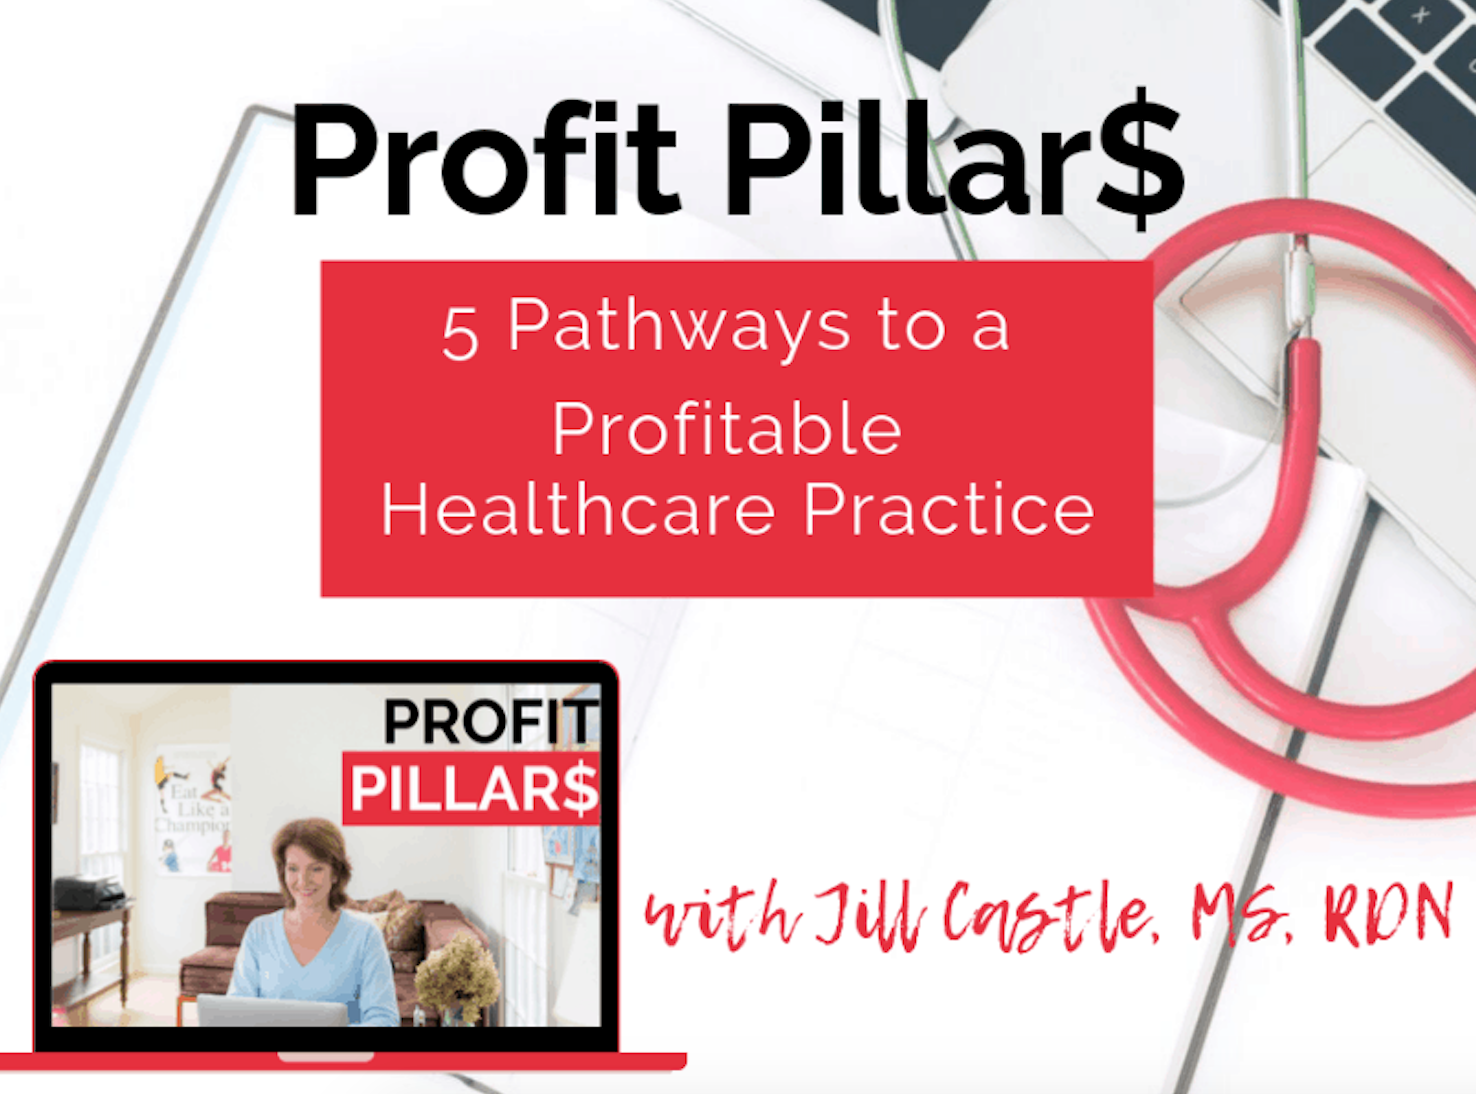 Profit Pillars: 5 Pathways to a Profitable Healthcare Practice